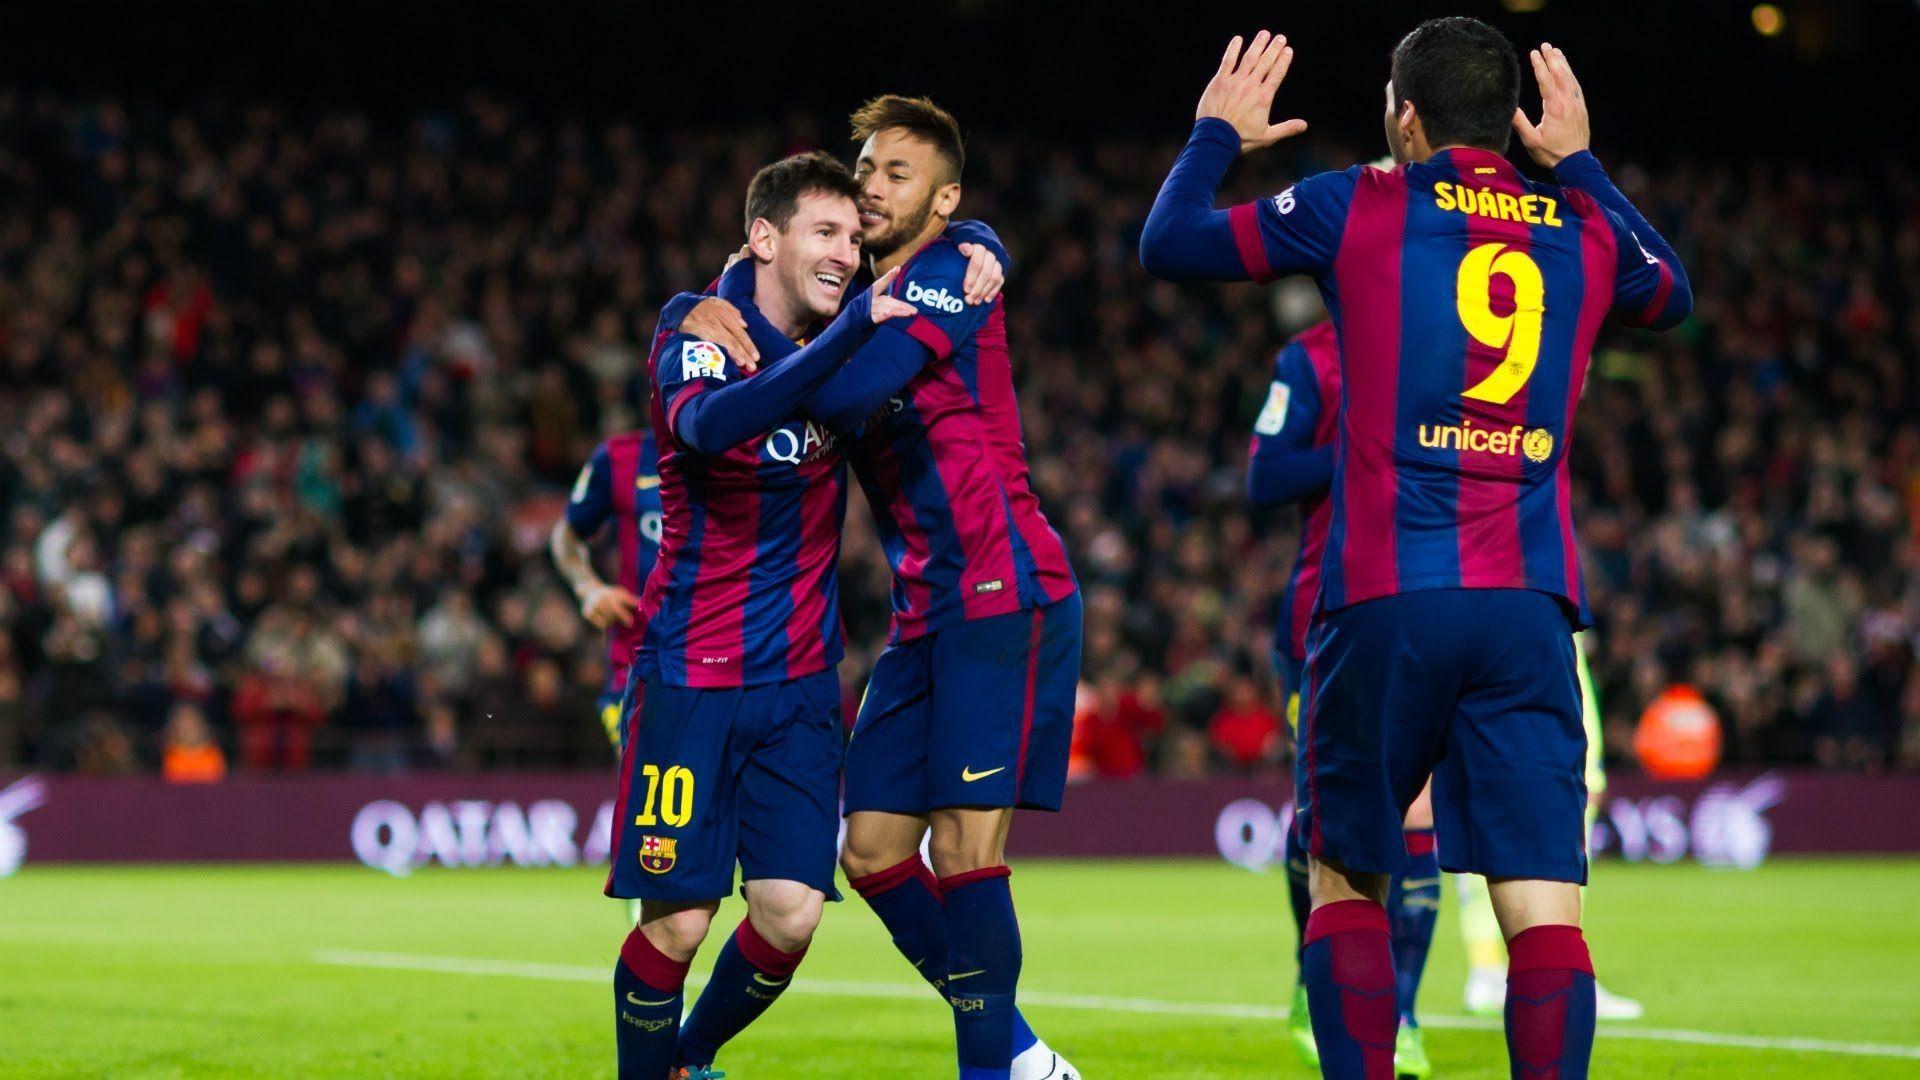 Suarez Messi Neymar Wallpaper 82549   NANOZINE